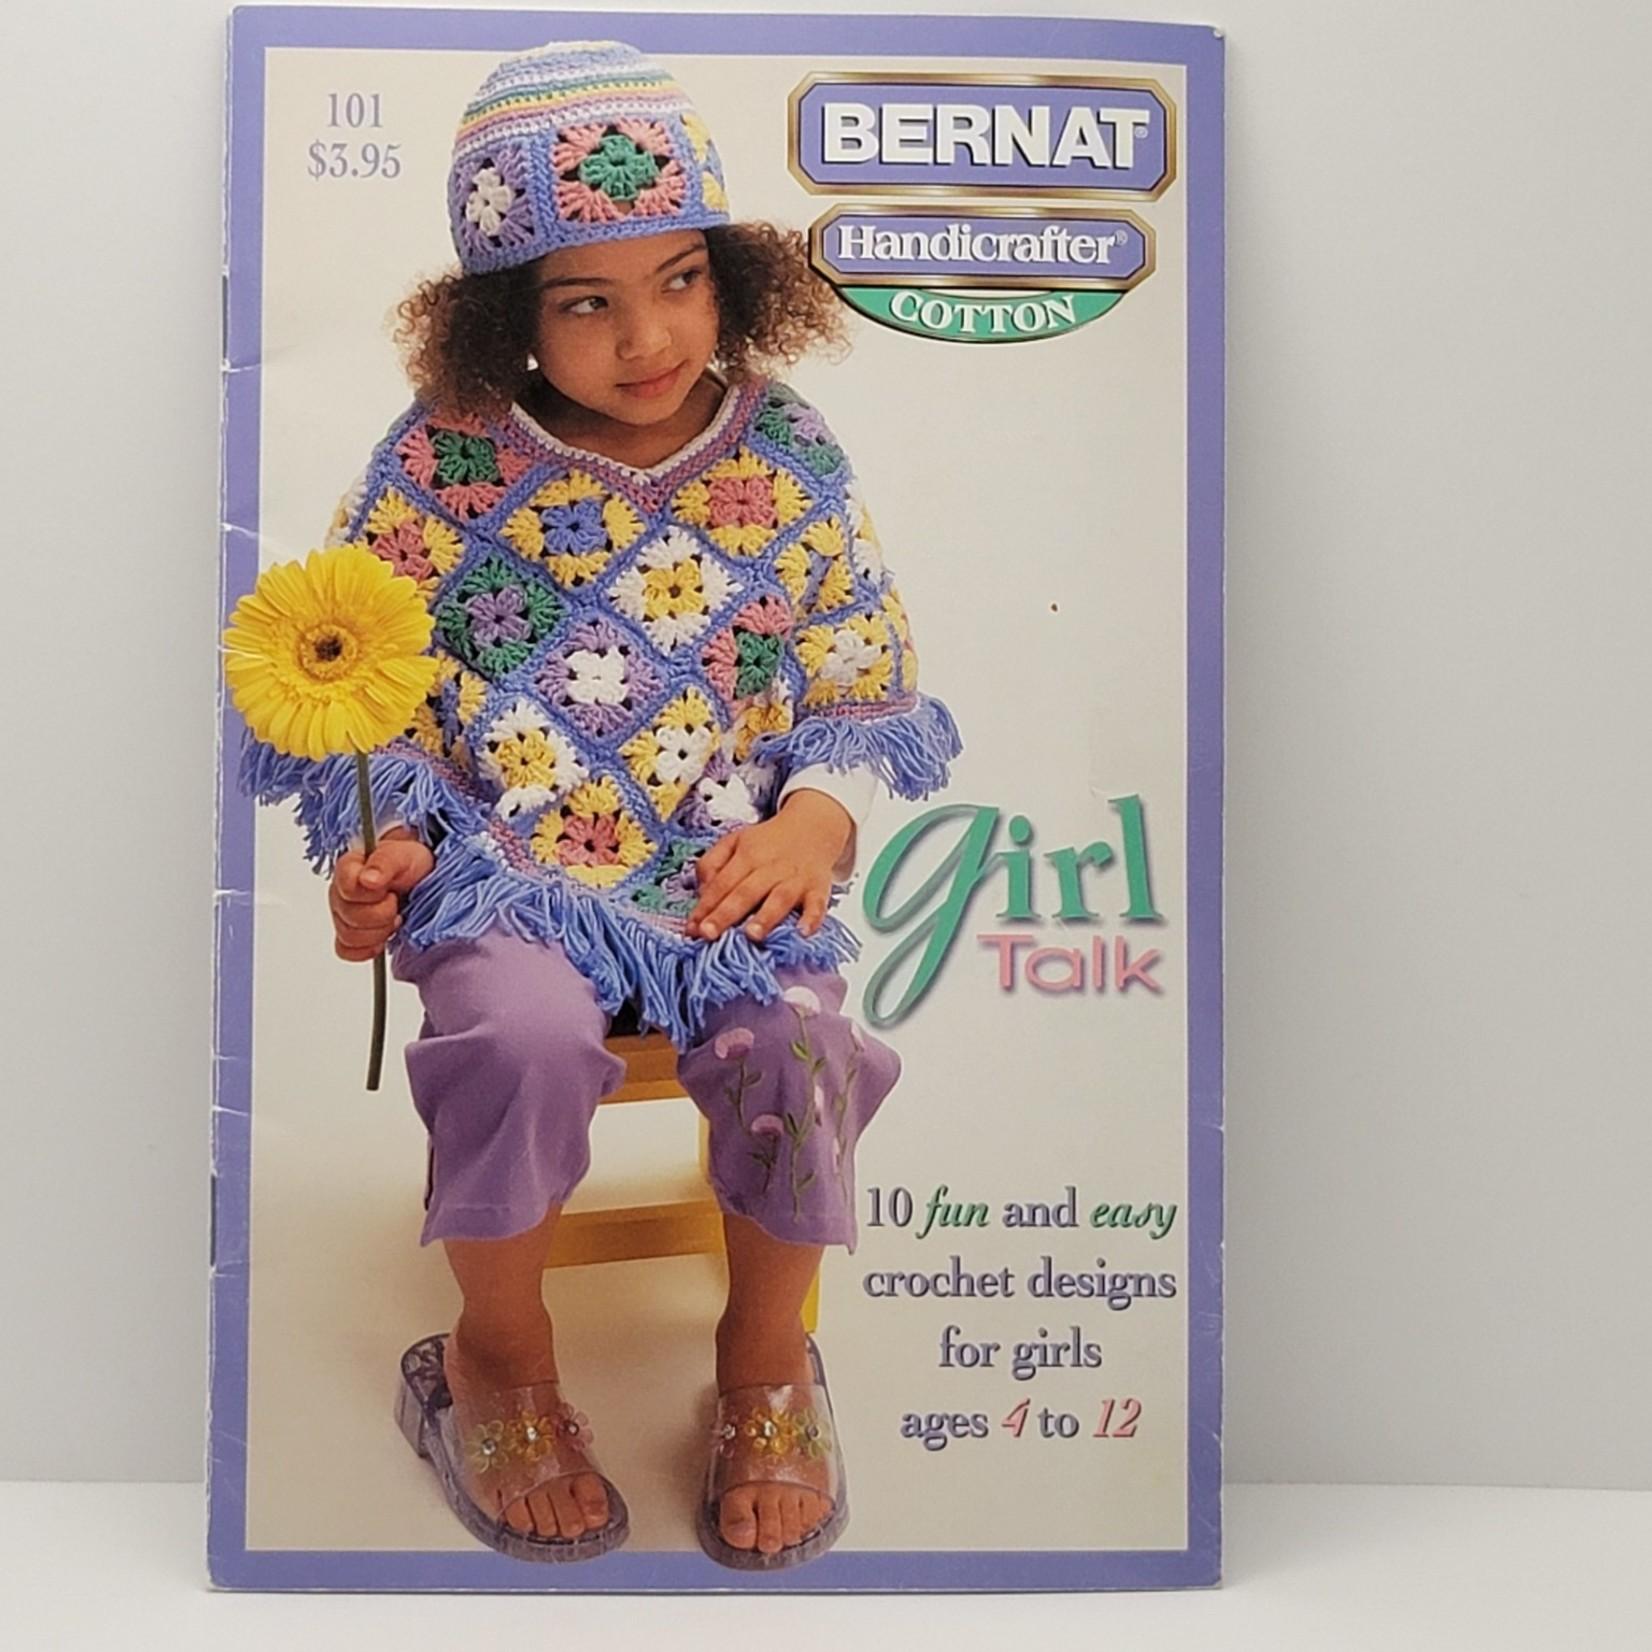 Bernat Crochet Patterns - Girl Talk (10 patterns)